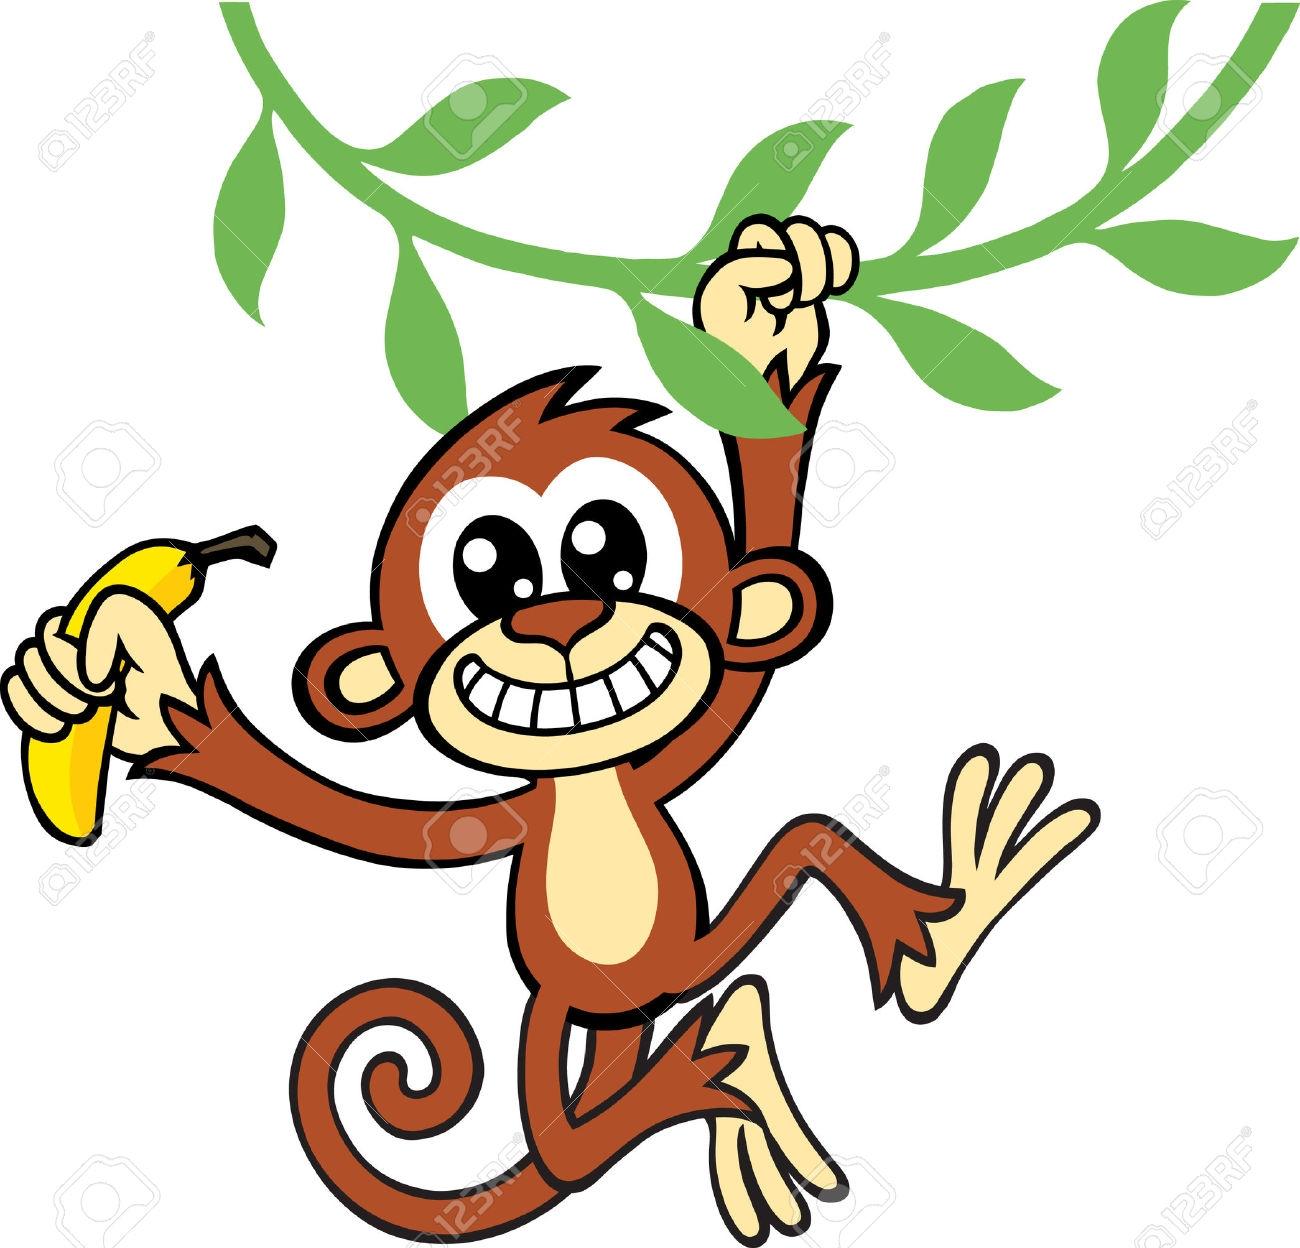 The Monkey Eat Banana Clip Art.